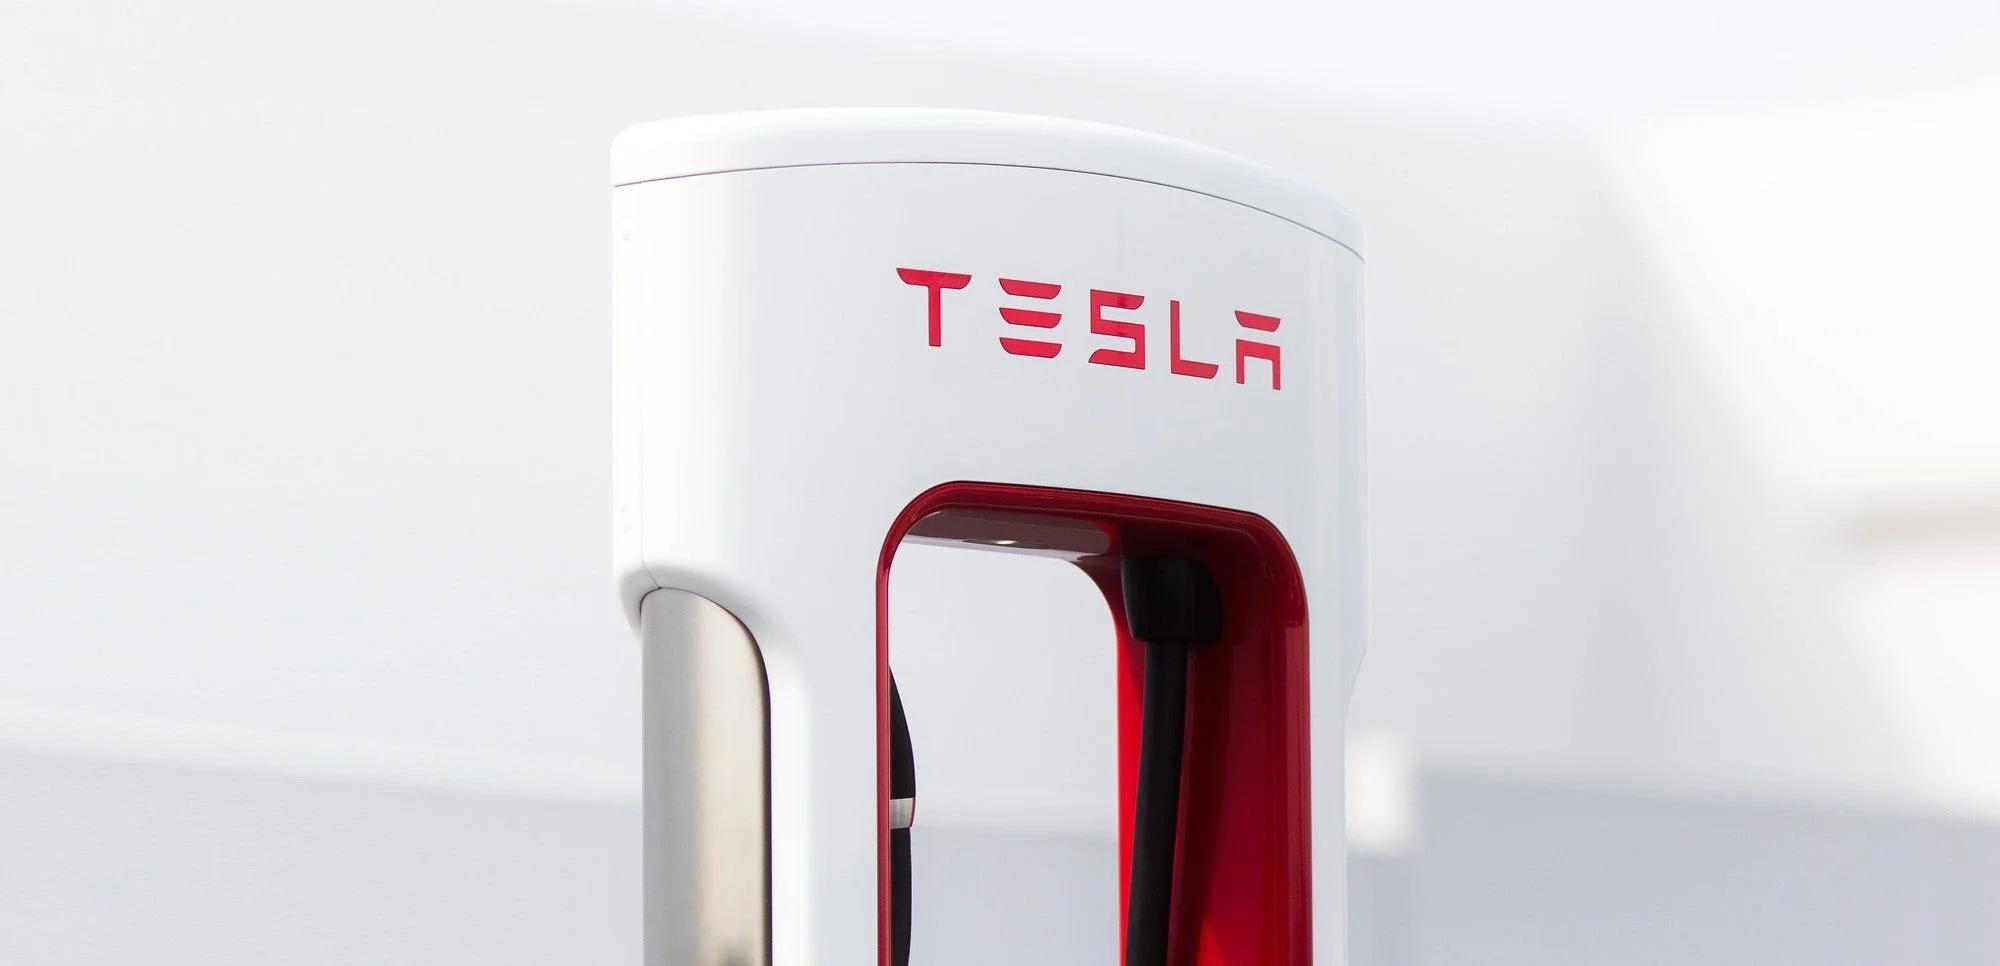 Buy the Tesla Dip? This 5-Star Investing Guru Just Did